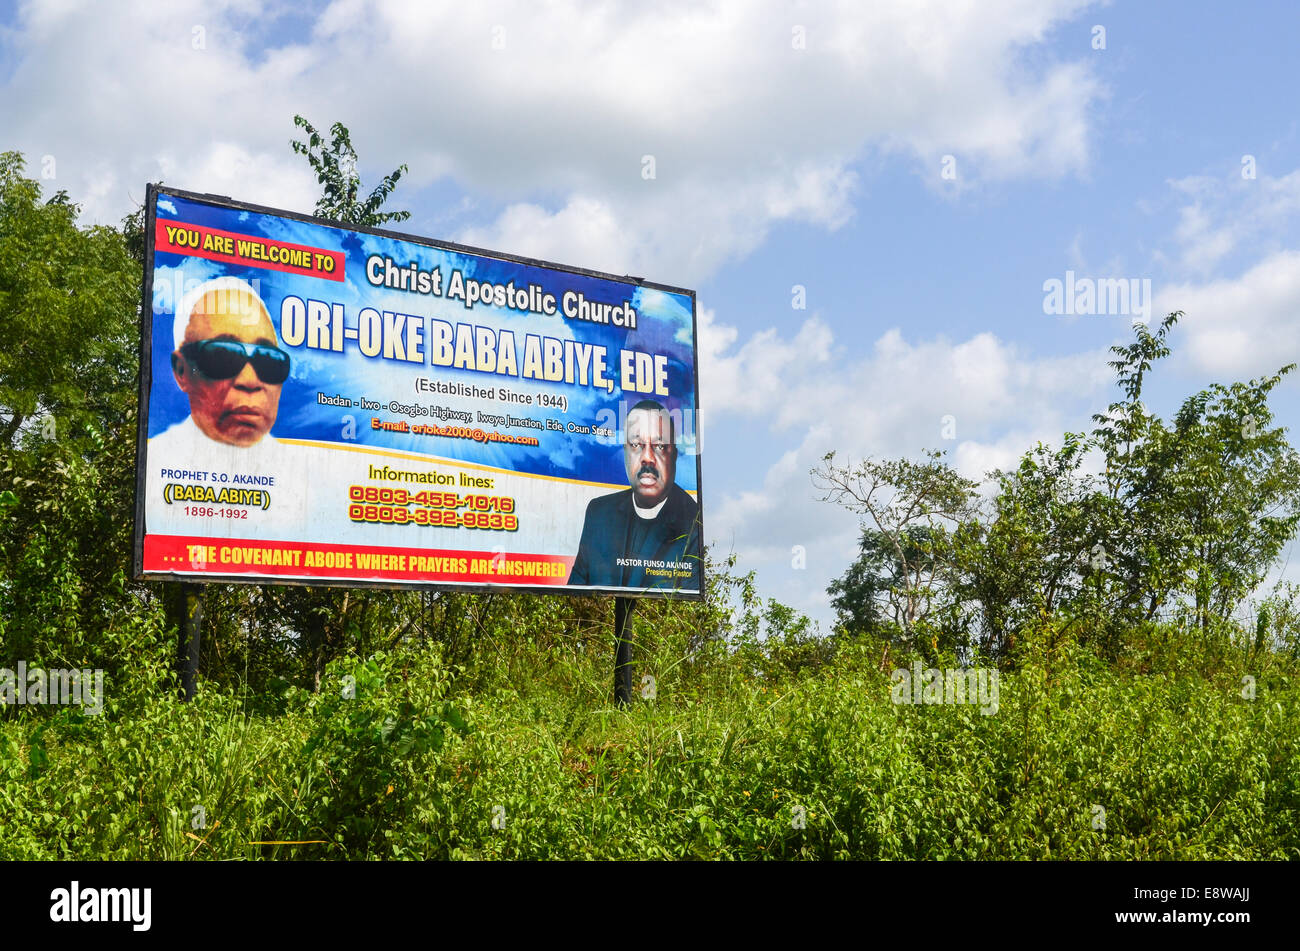 Religious sign for an apostolic church in Nigeria, by Ori-Oke Baba Abiye - Stock Image